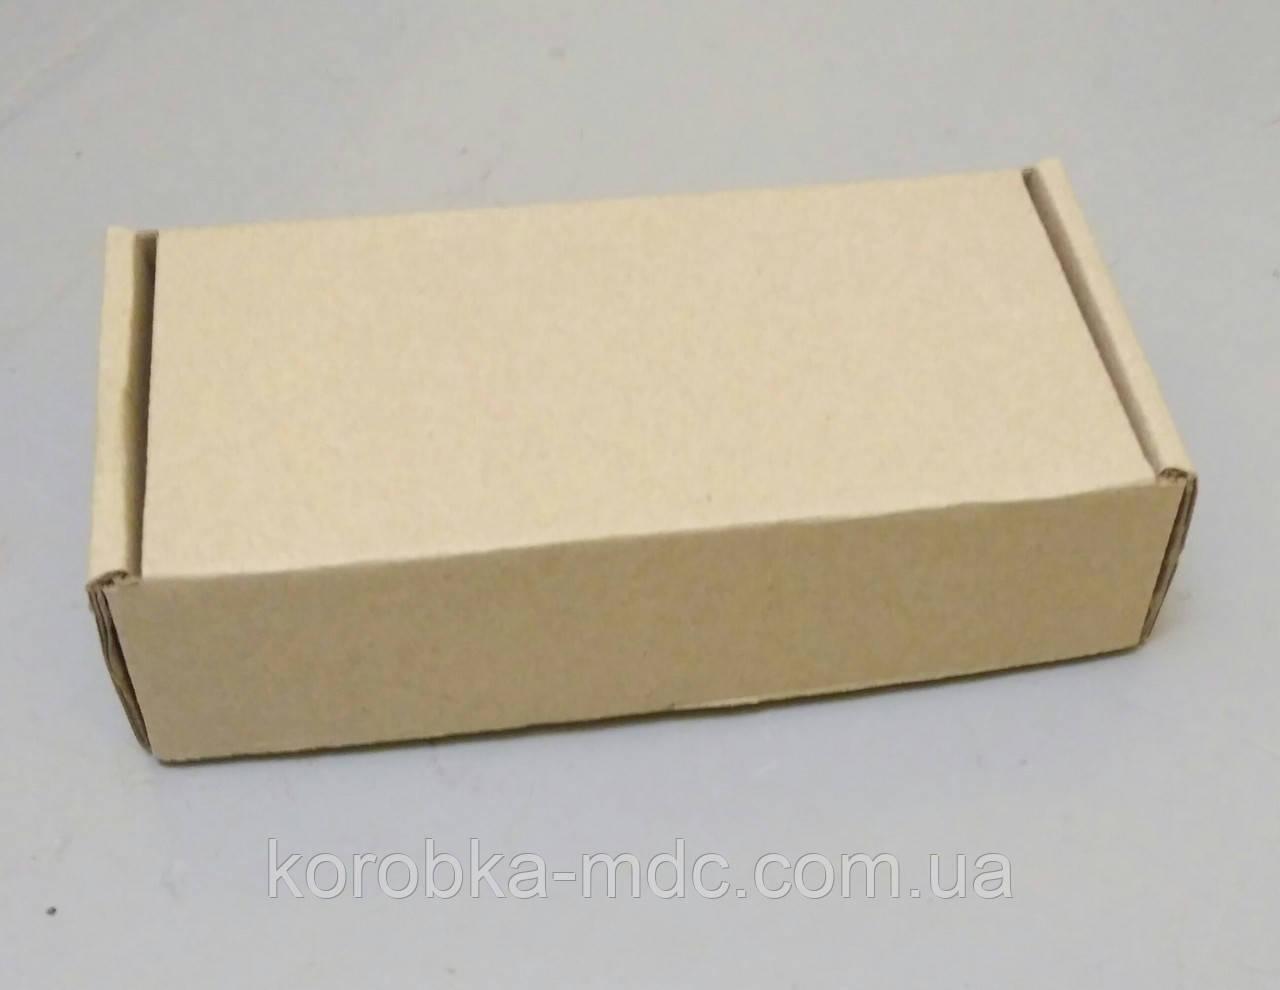 Коробка бурая 152х105х32 самосборная (шкатулка)